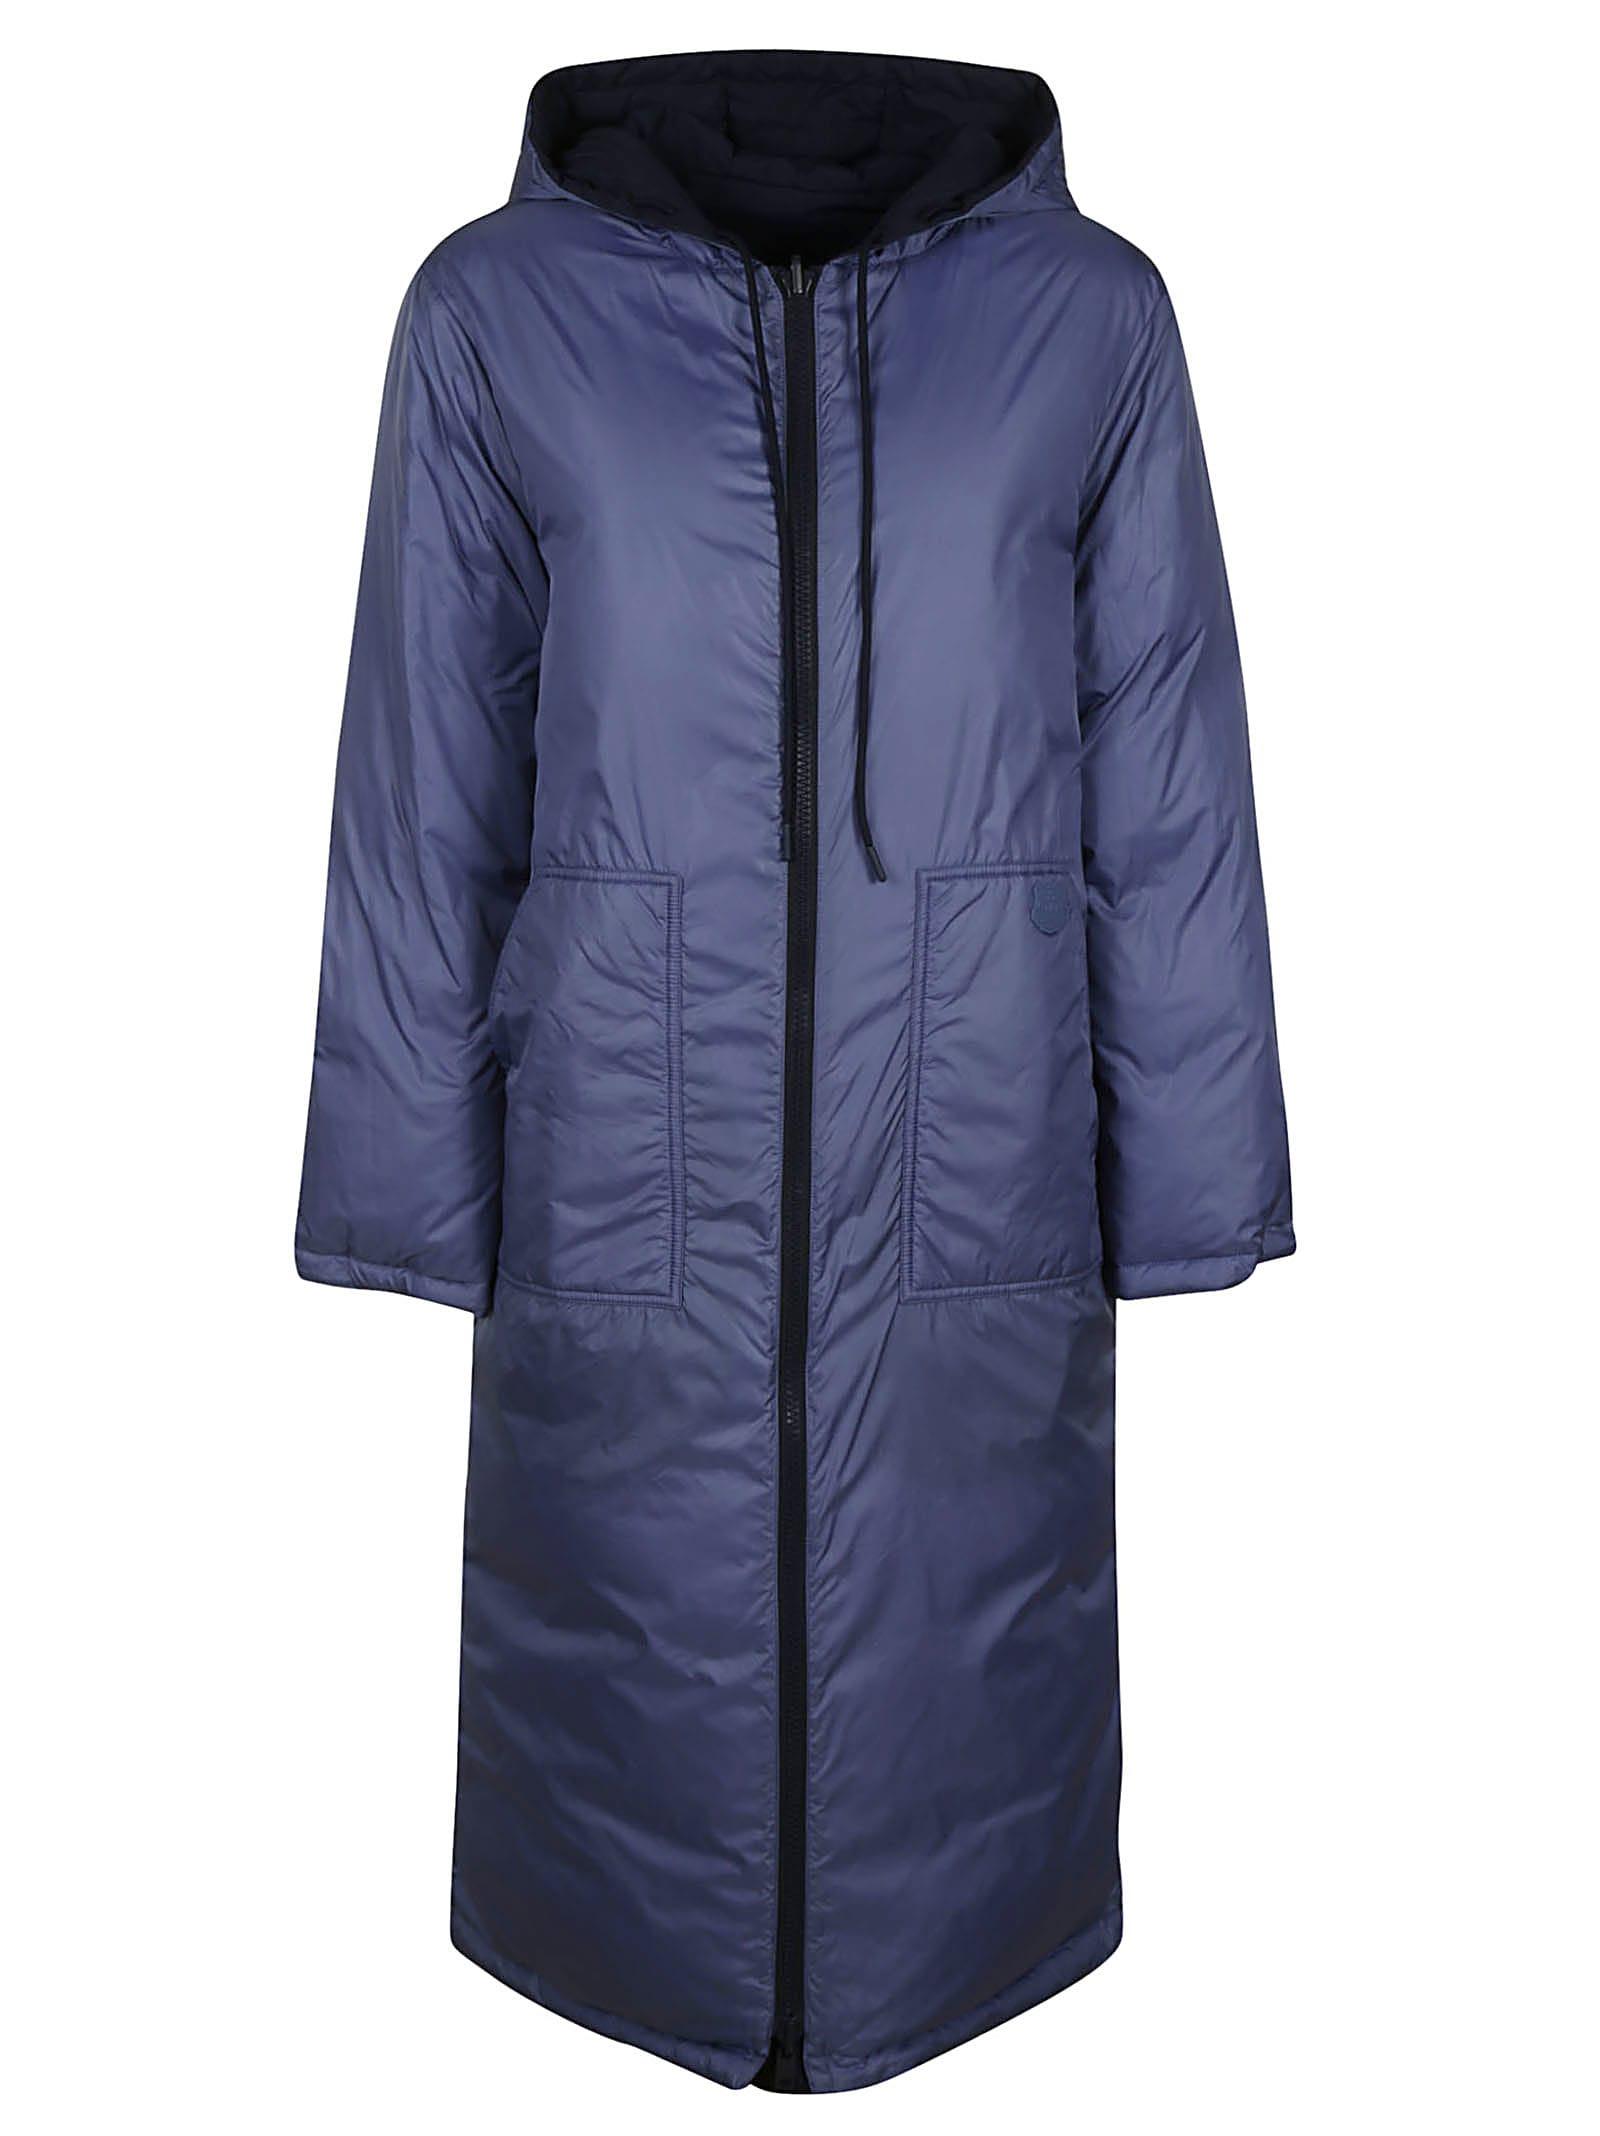 Kenzo Elongated Puffer Reversible Raincoat